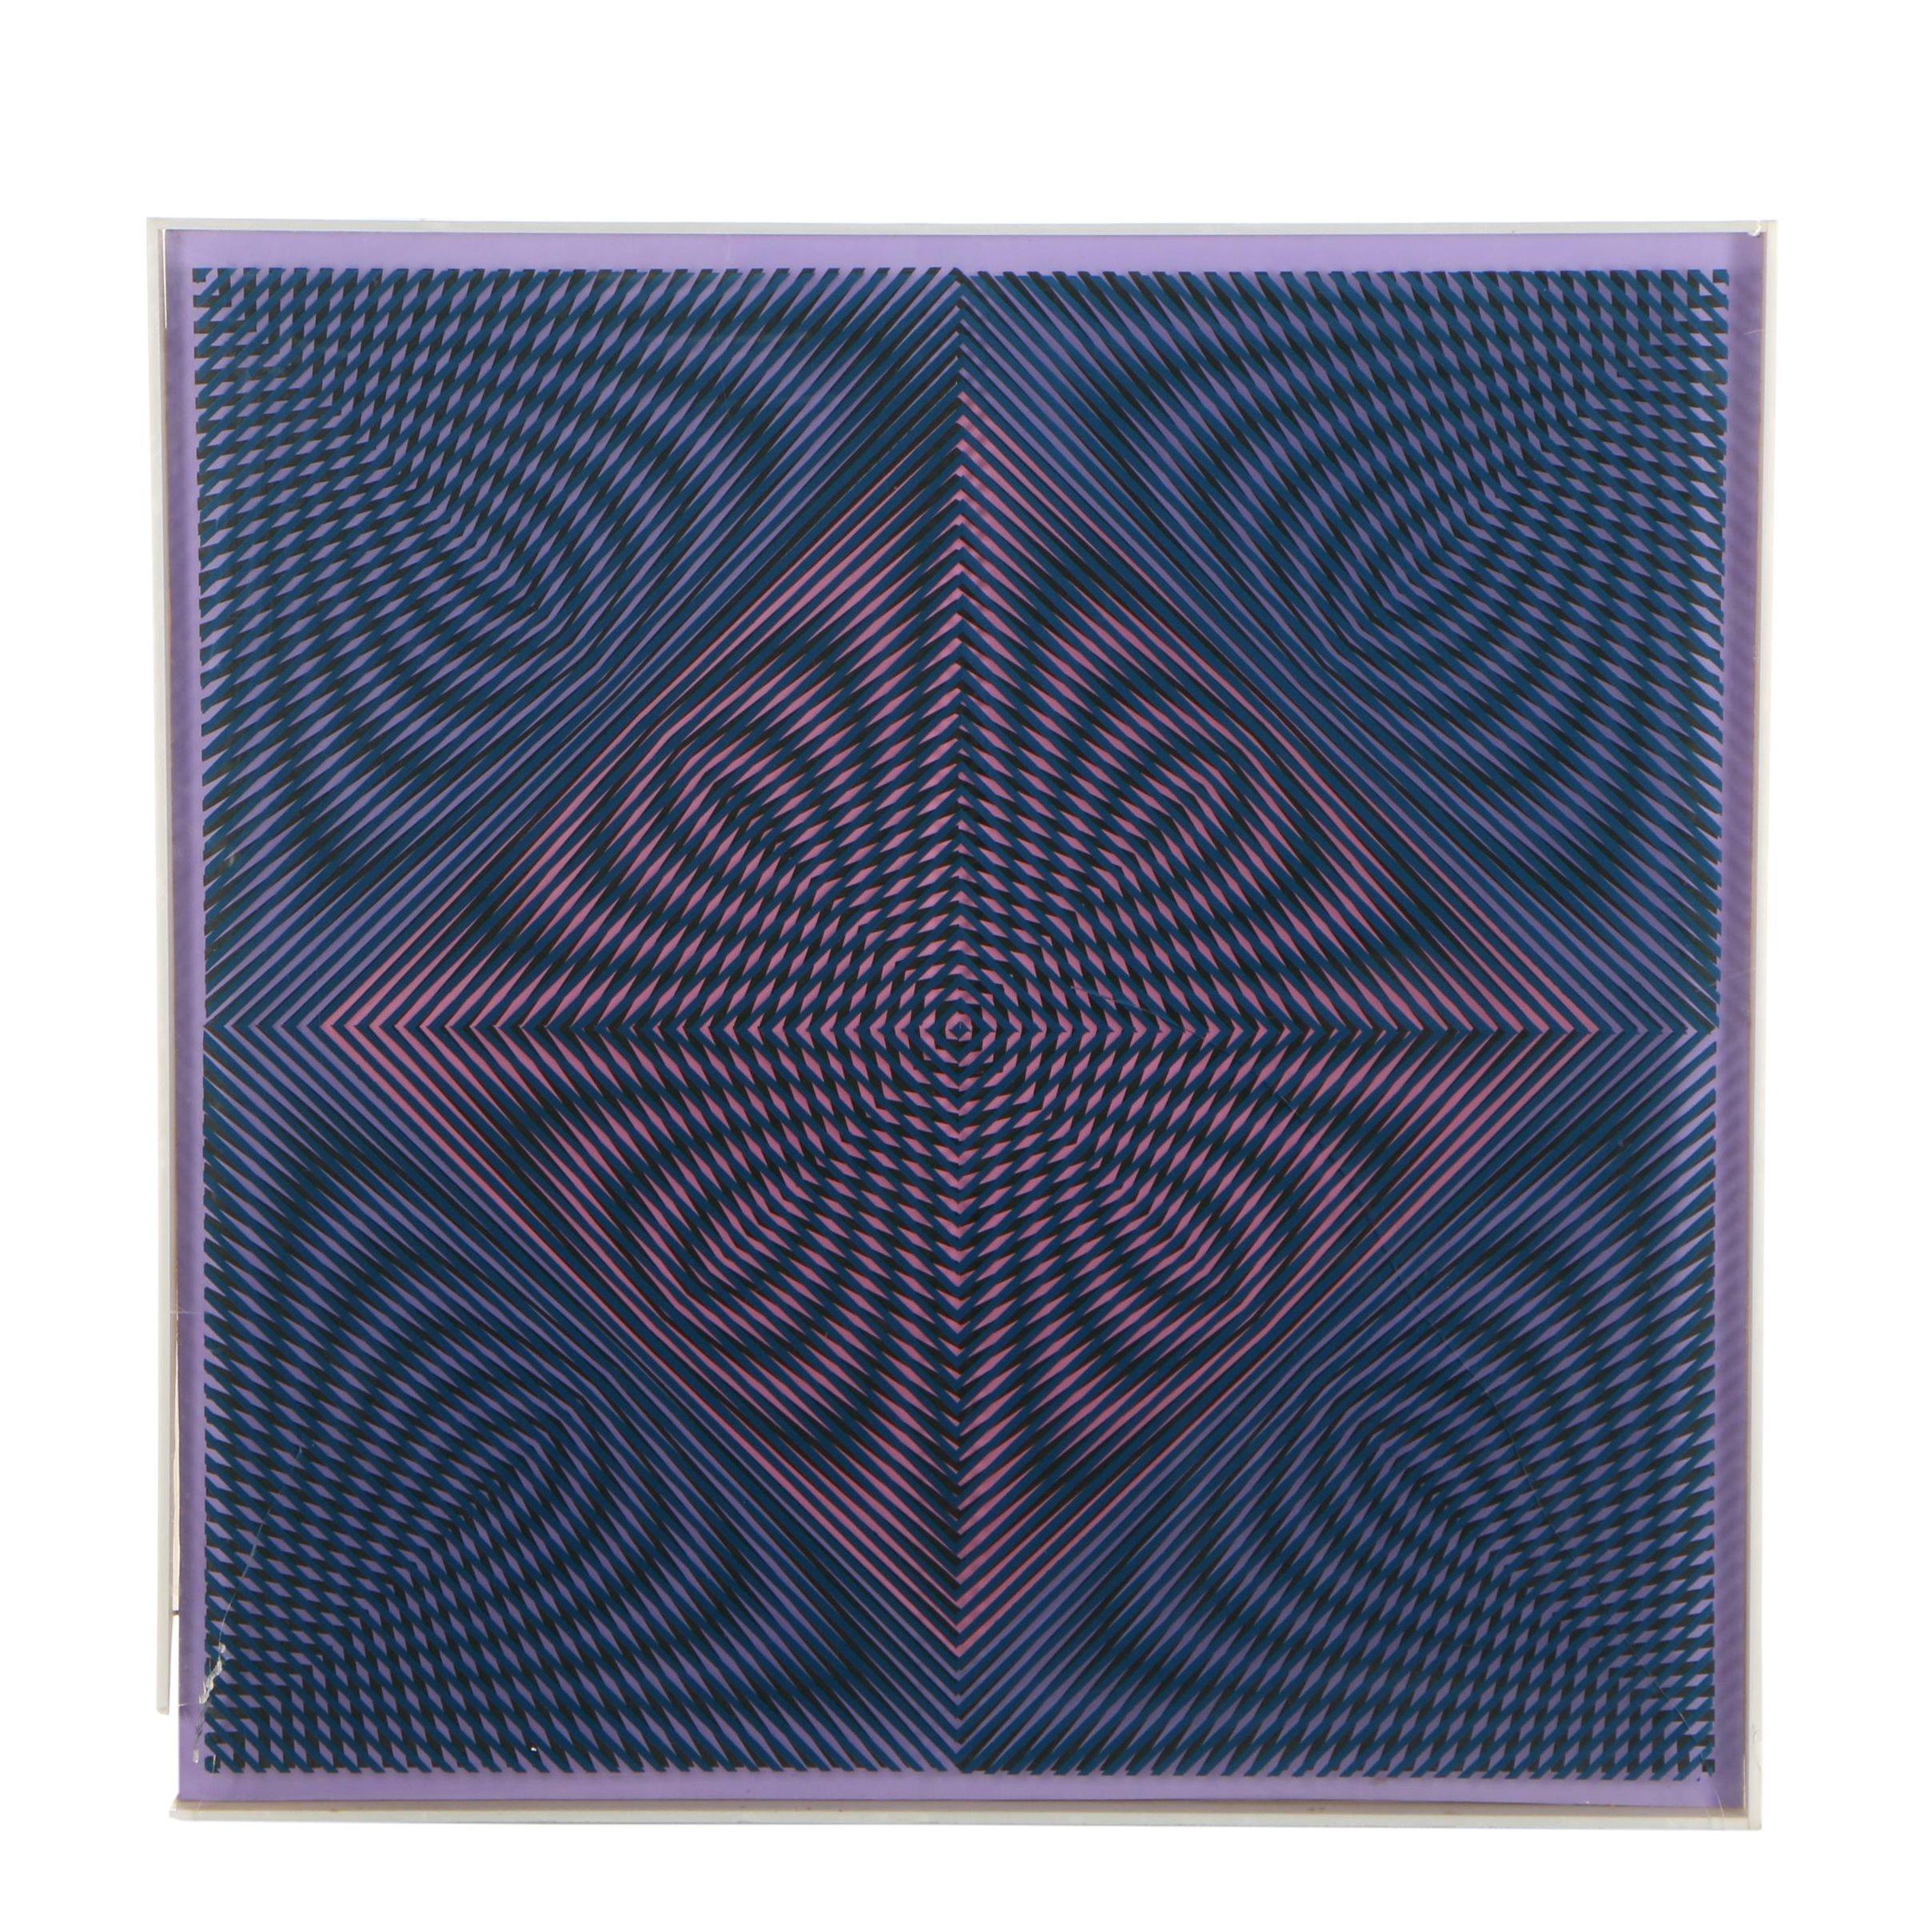 William Leete Multidimensional Serigraph on Plexiglas